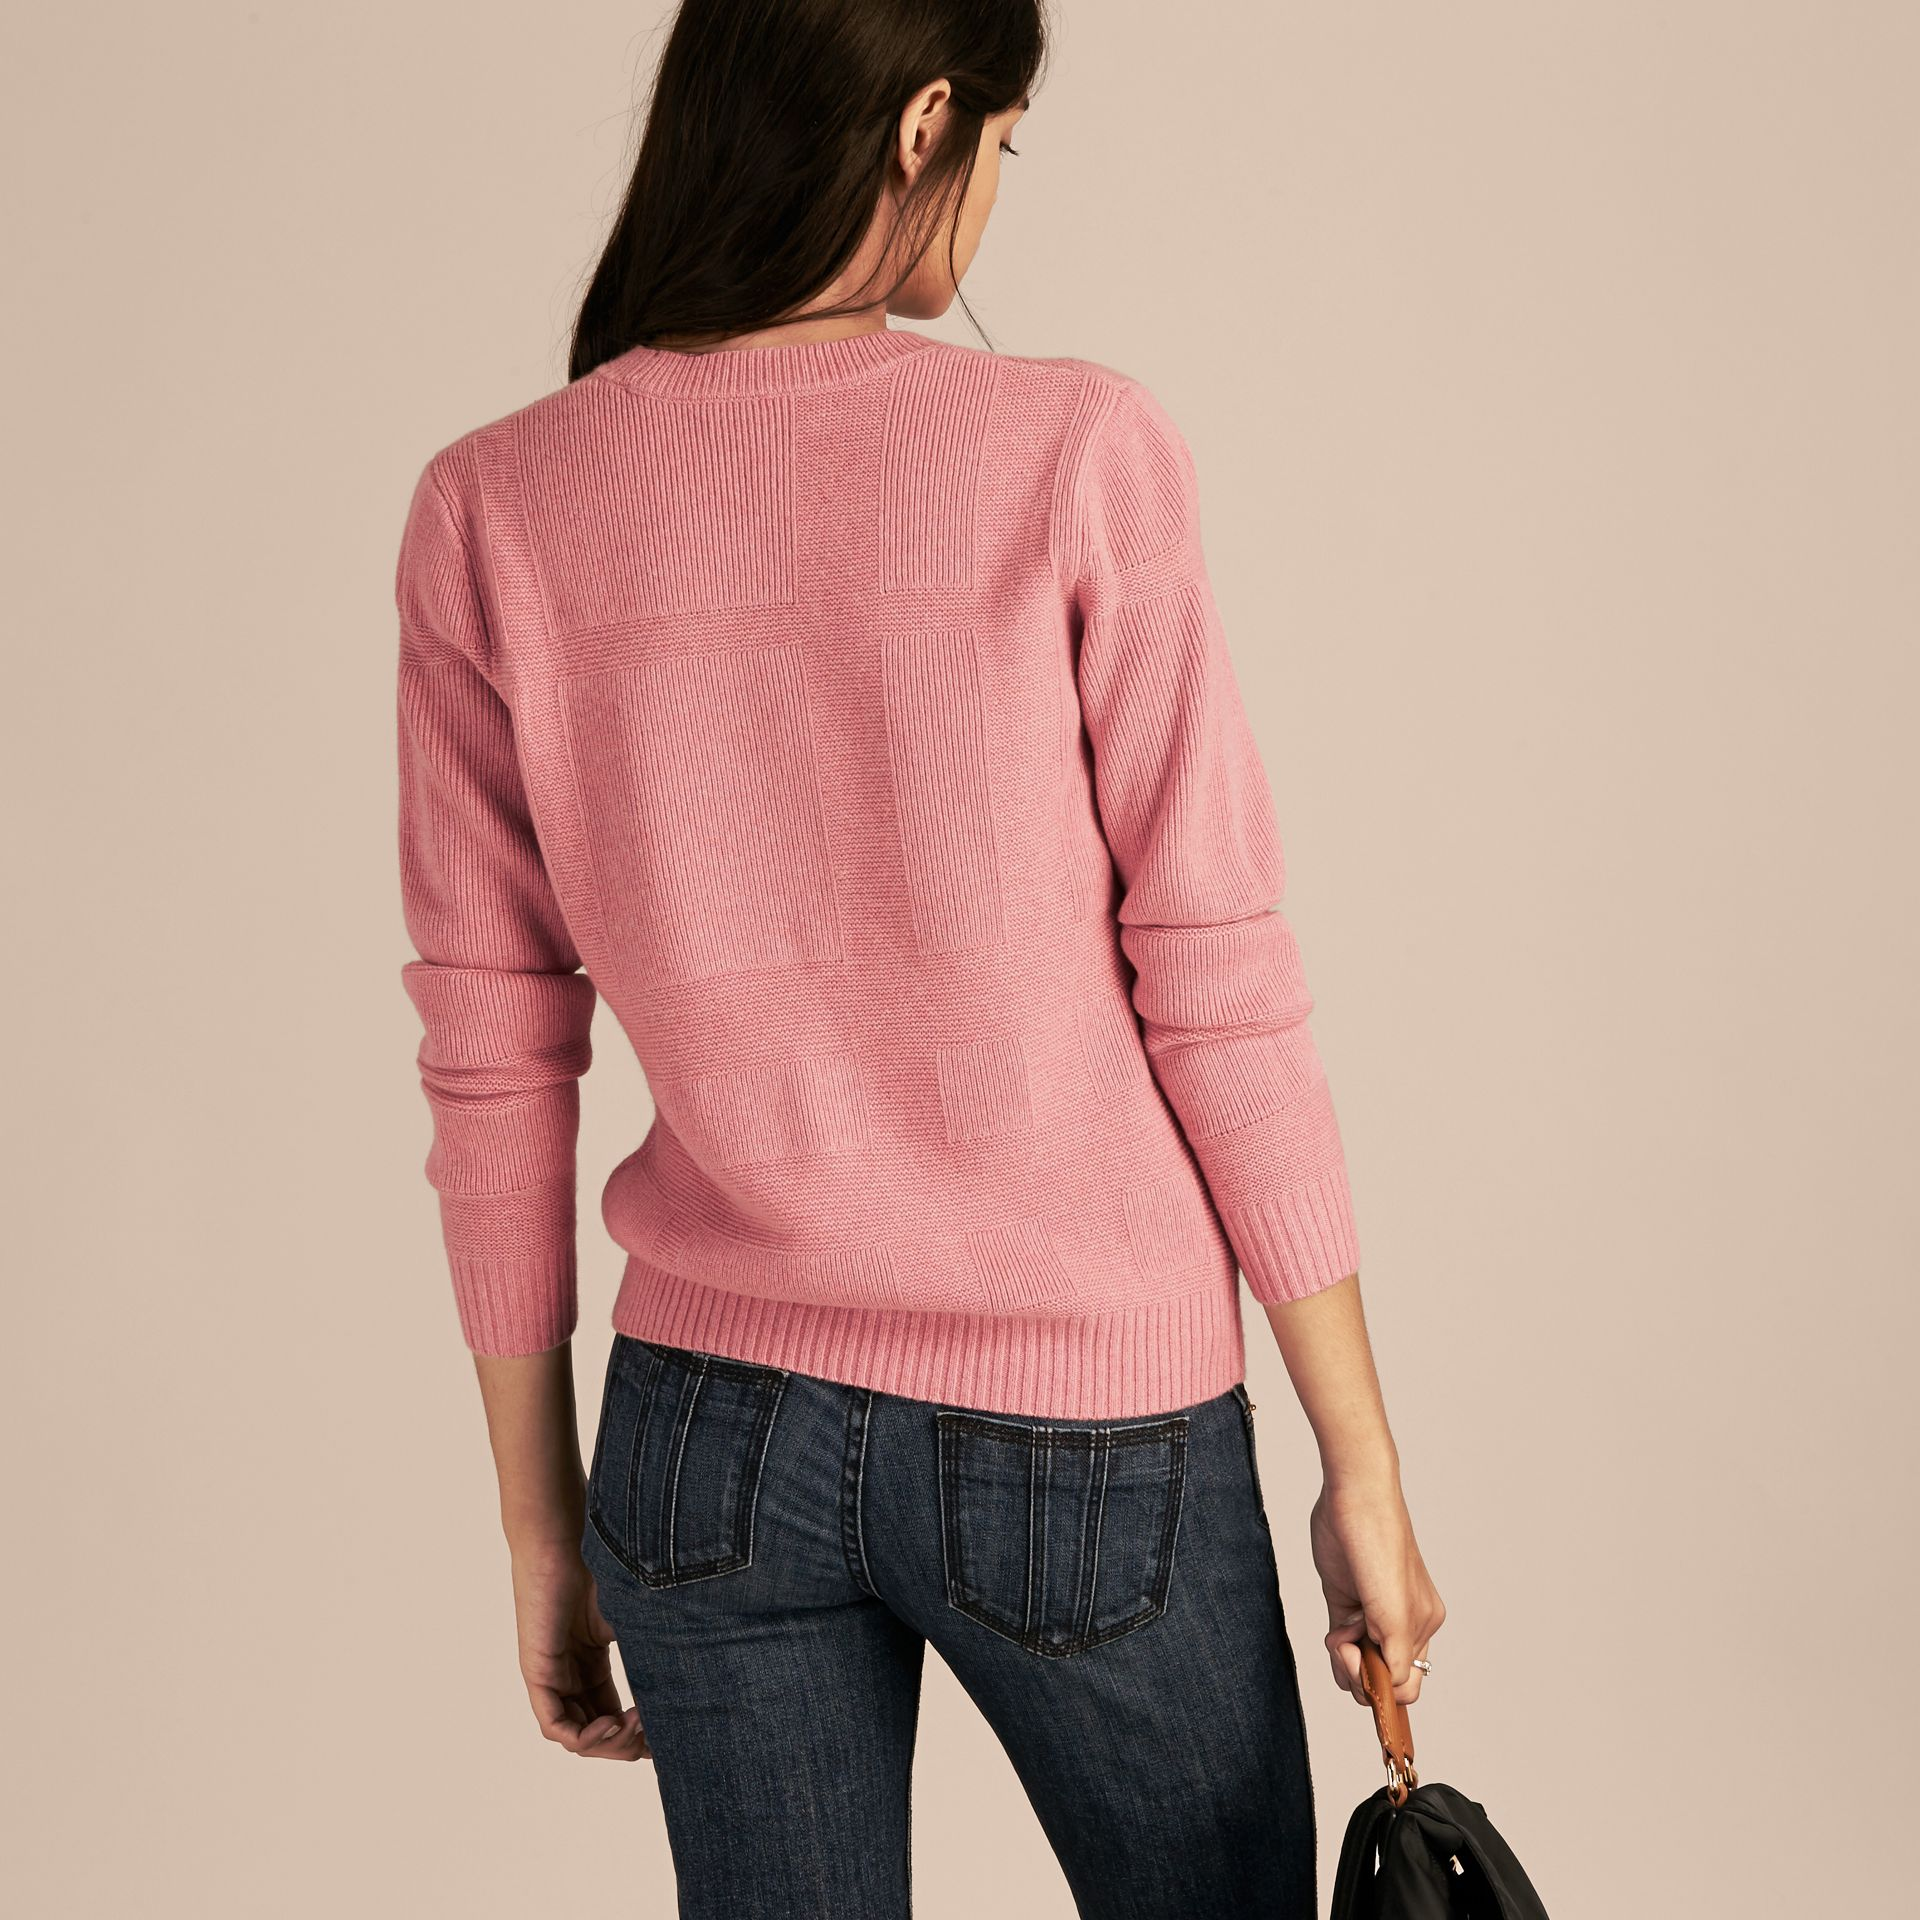 Hydrangea pink melange Check-knit Wool Cashmere Sweater Hydrangea Pink Melange - gallery image 3